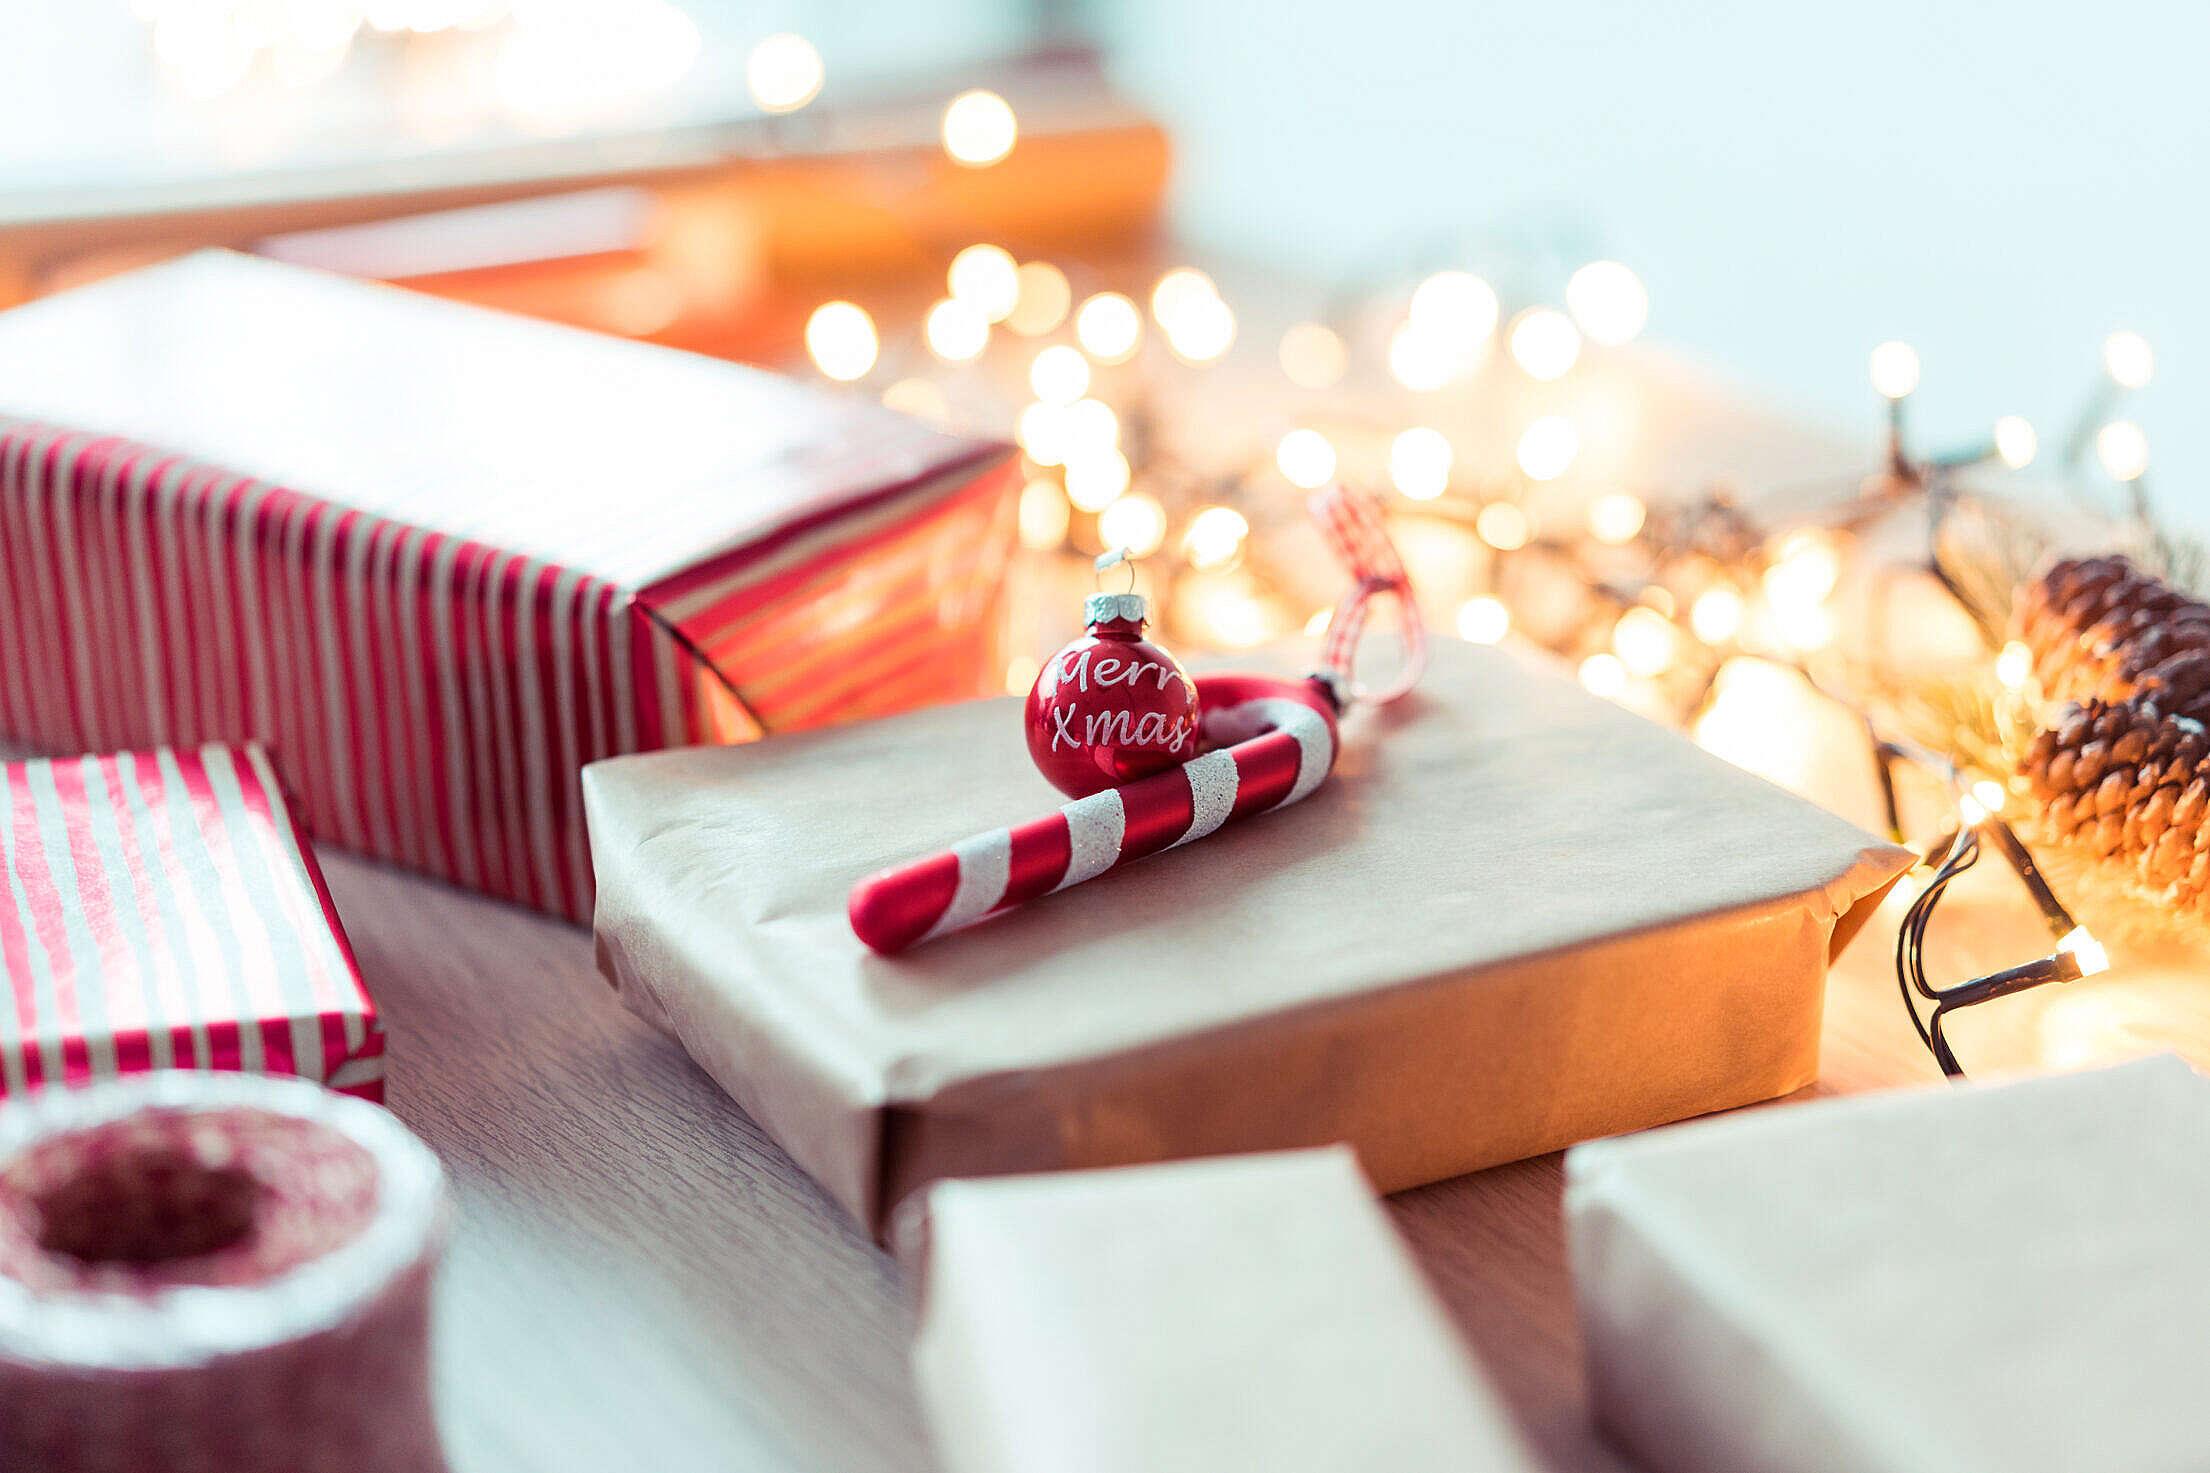 Christmas Preparations Presents Decorations Lights Free Stock Photo